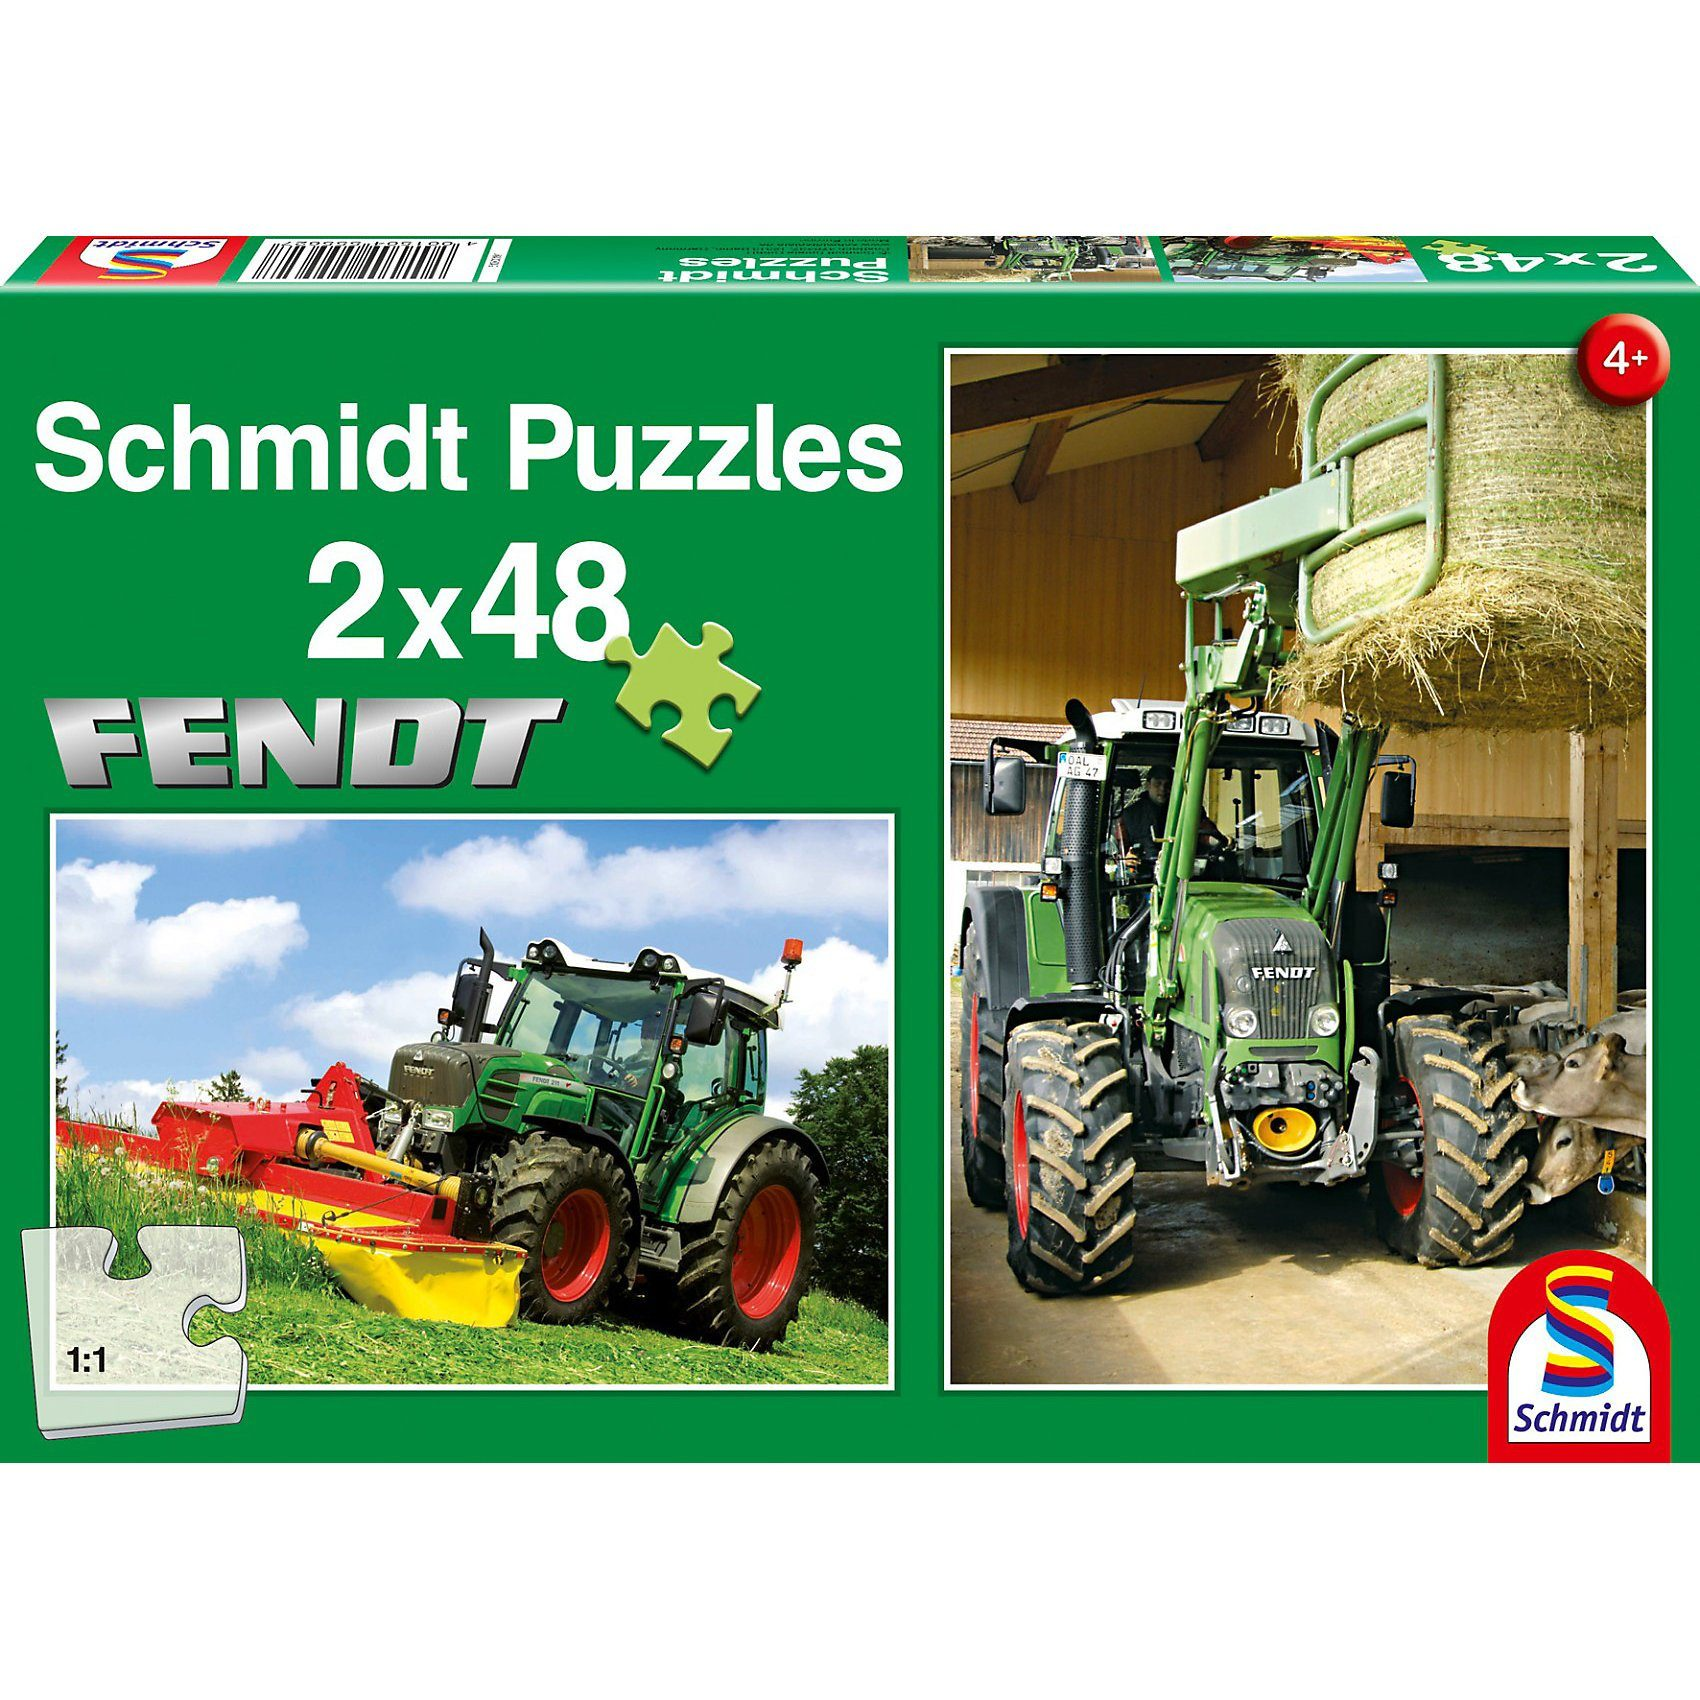 Schmidt Spiele Fendt Traktoren, 2x48 Teile